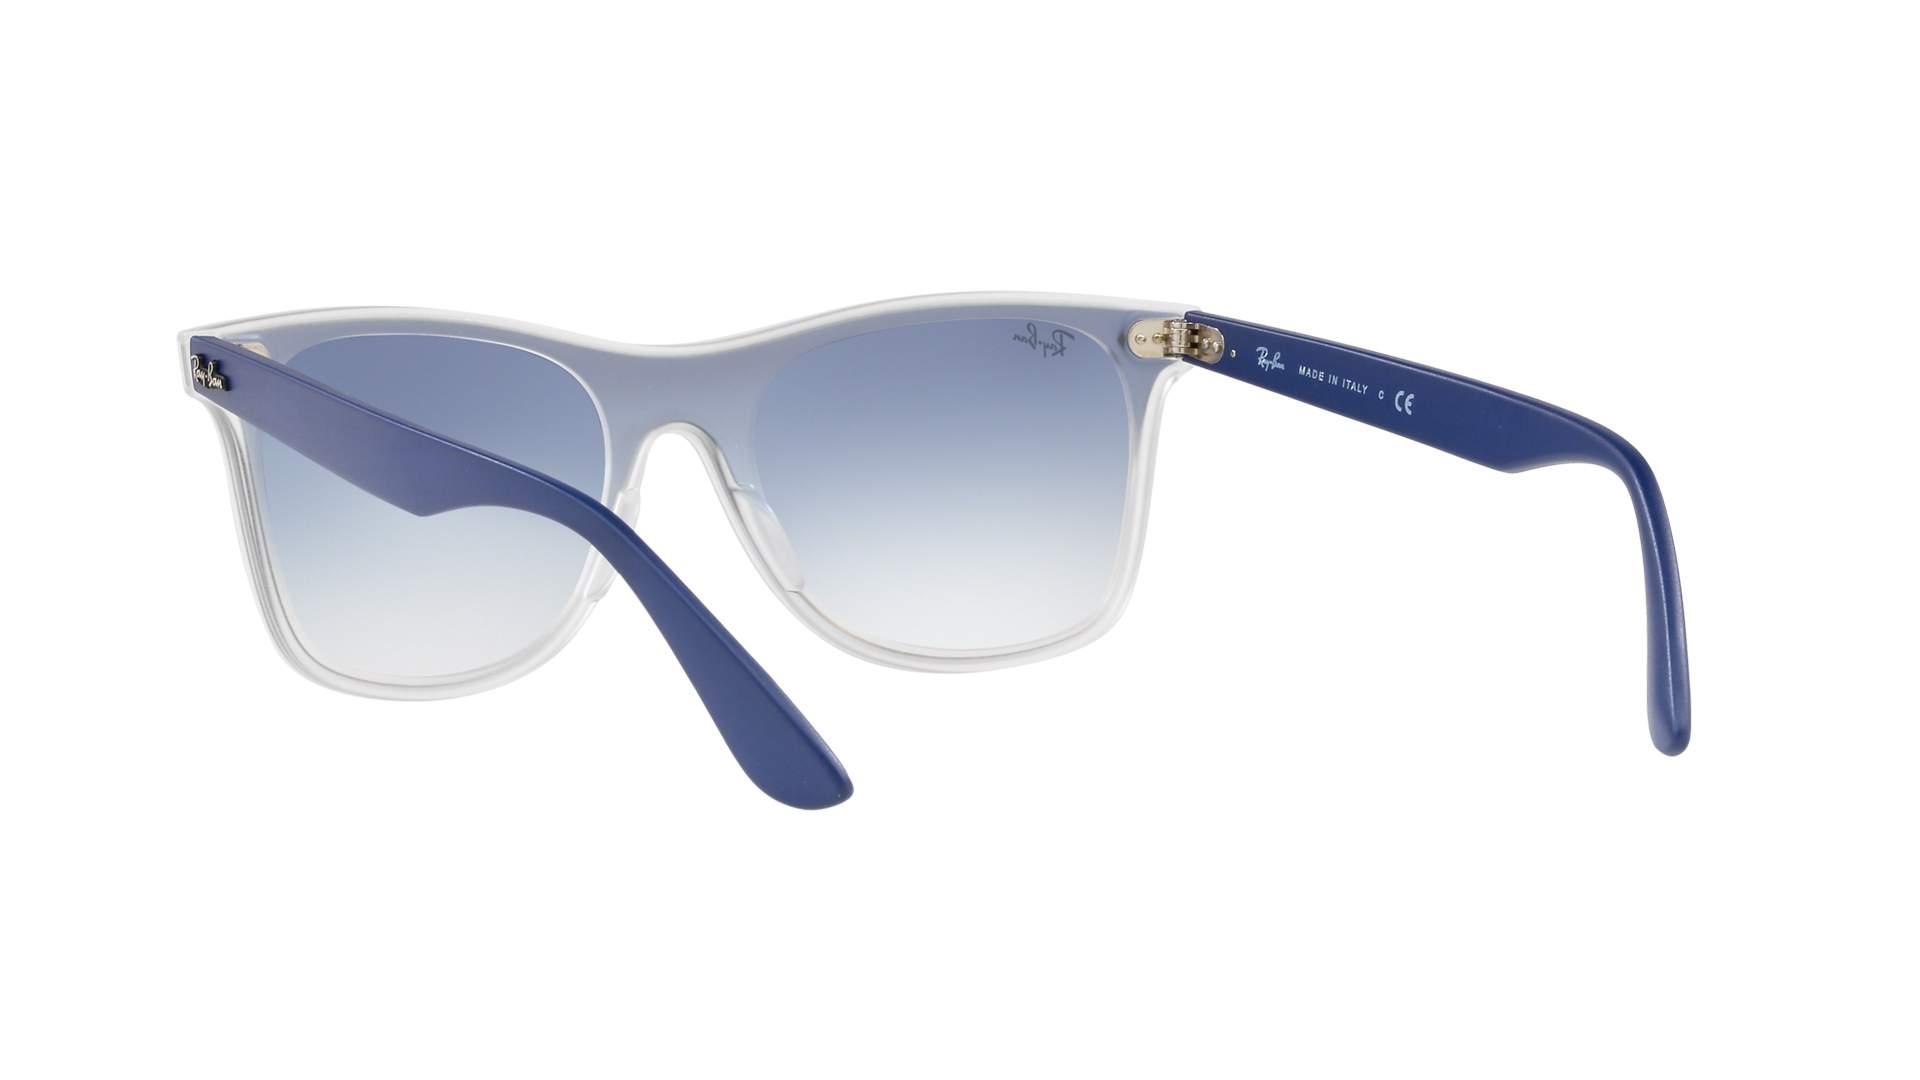 bf038fe8be Sunglasses Ray-Ban Wayfarer Blaze Blue RB4440N 6356 X0 41-18 Medium  Gradient Mirror